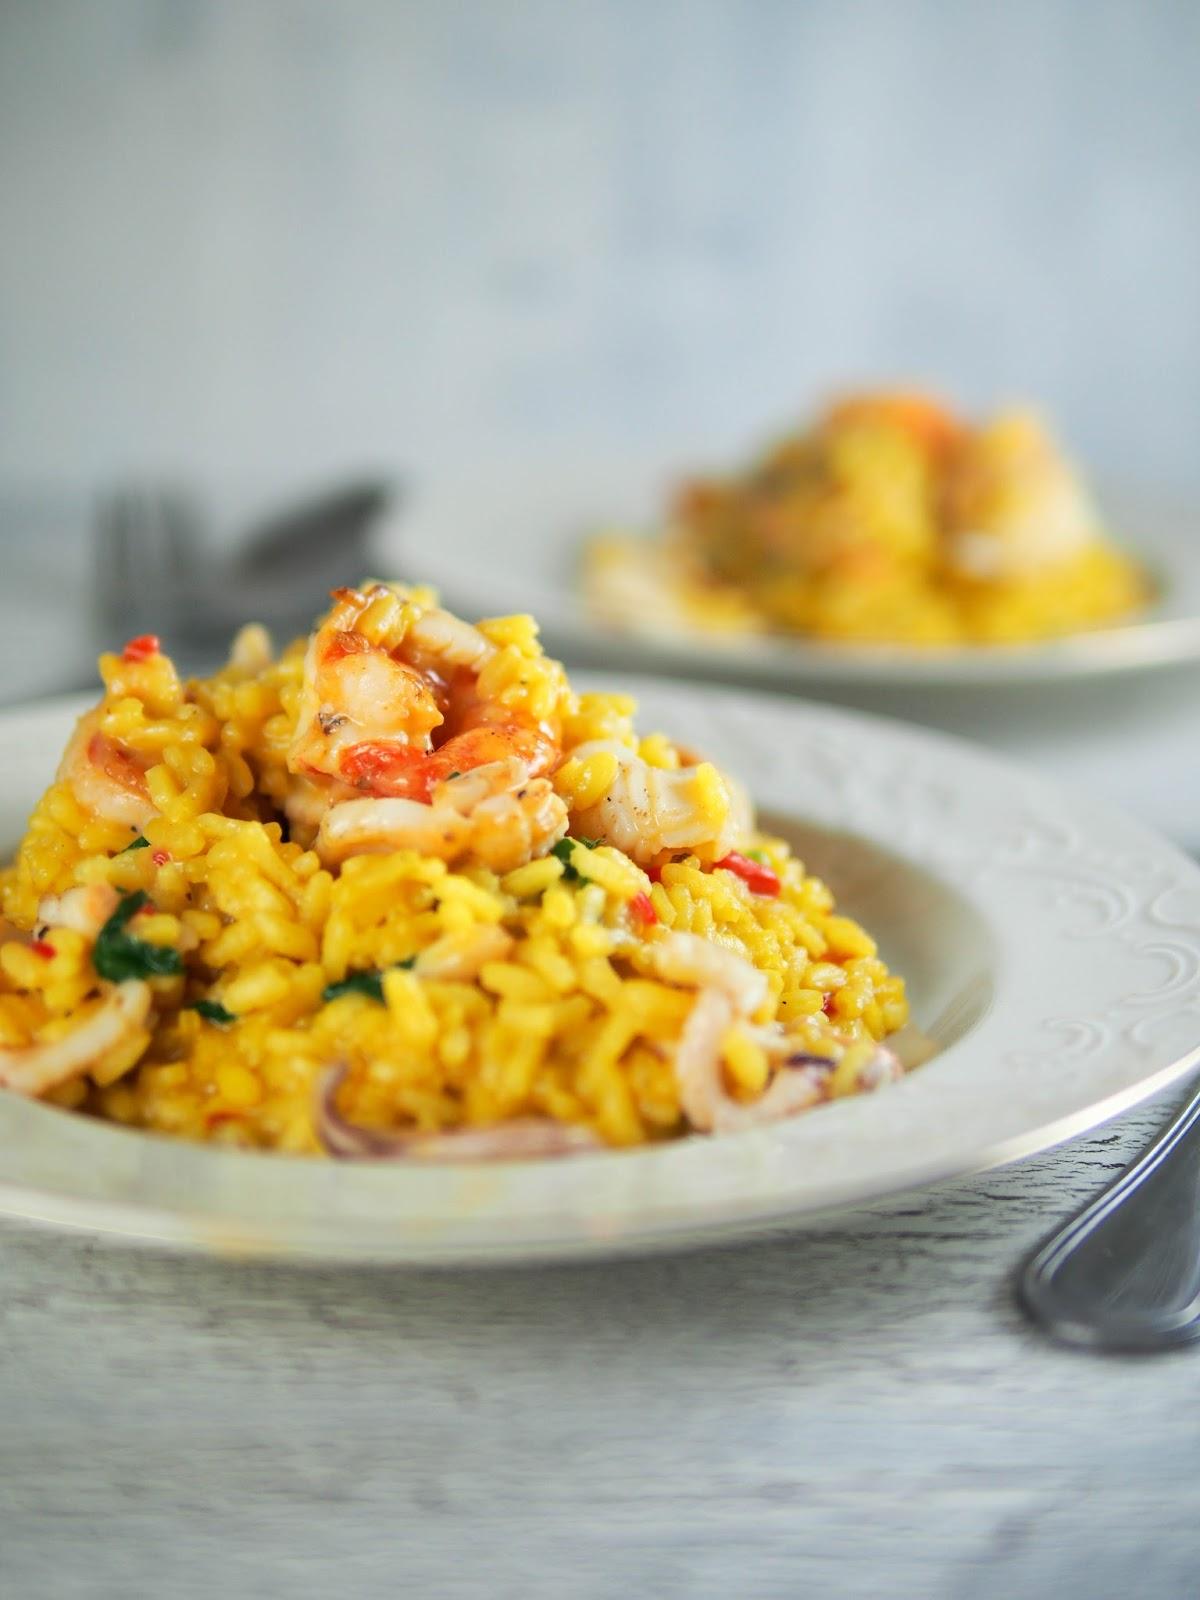 Foodmanna: Seafood Risotto